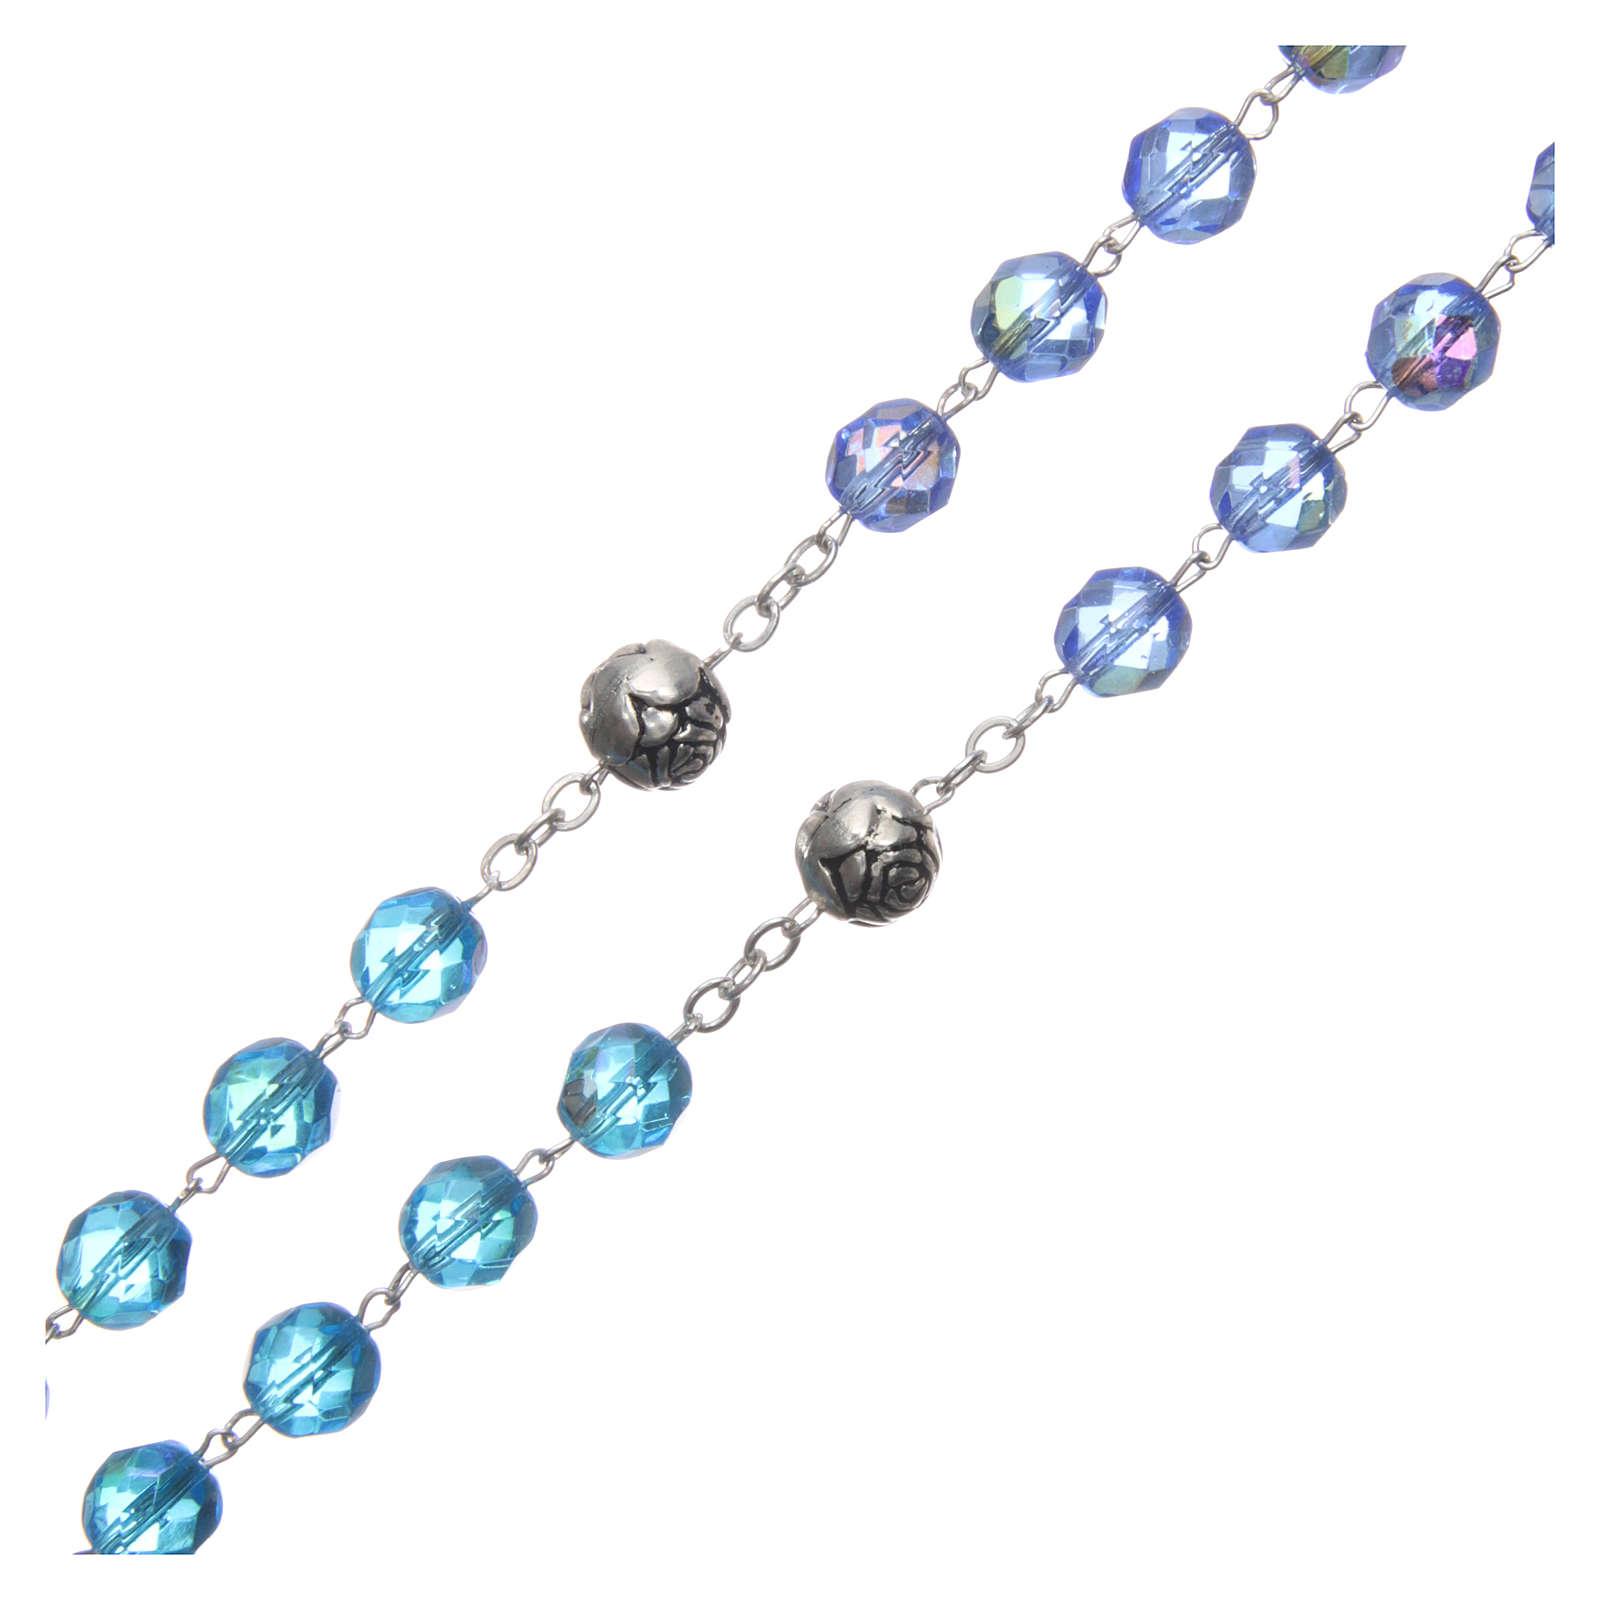 Rosario cristallo sfumature blu crociera parlante FRA 8 mm 4